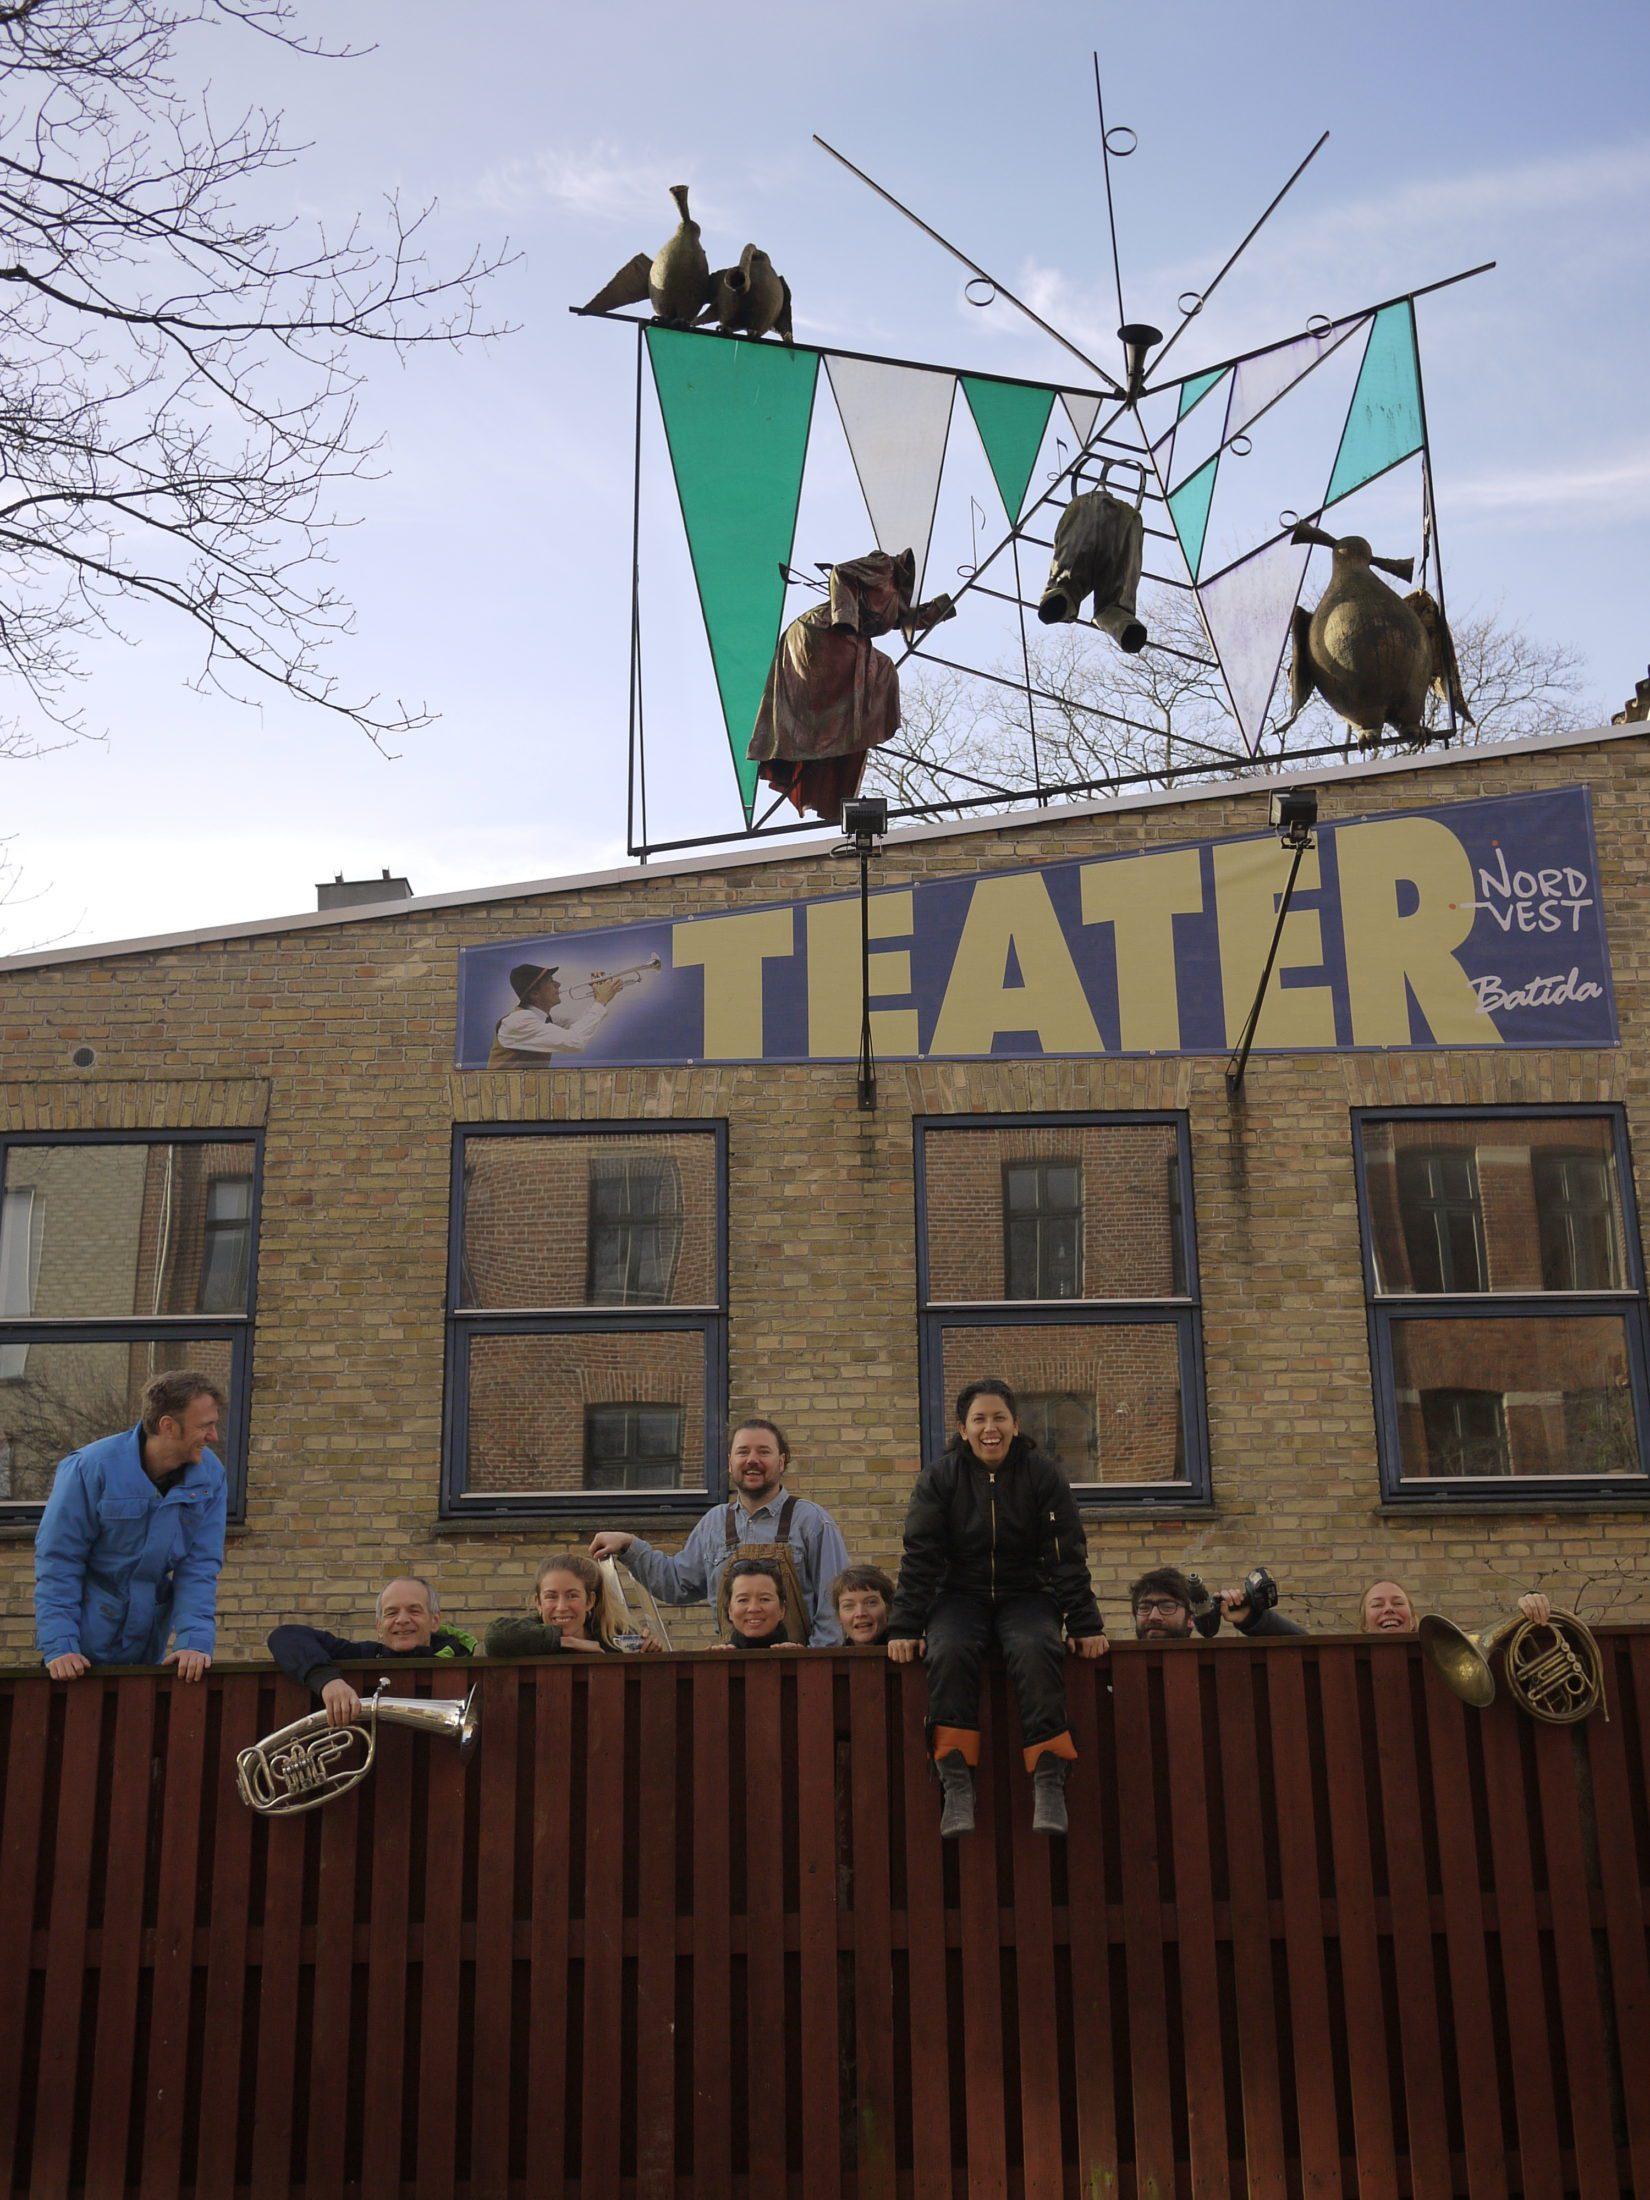 Der ligger et teater i Nordvest